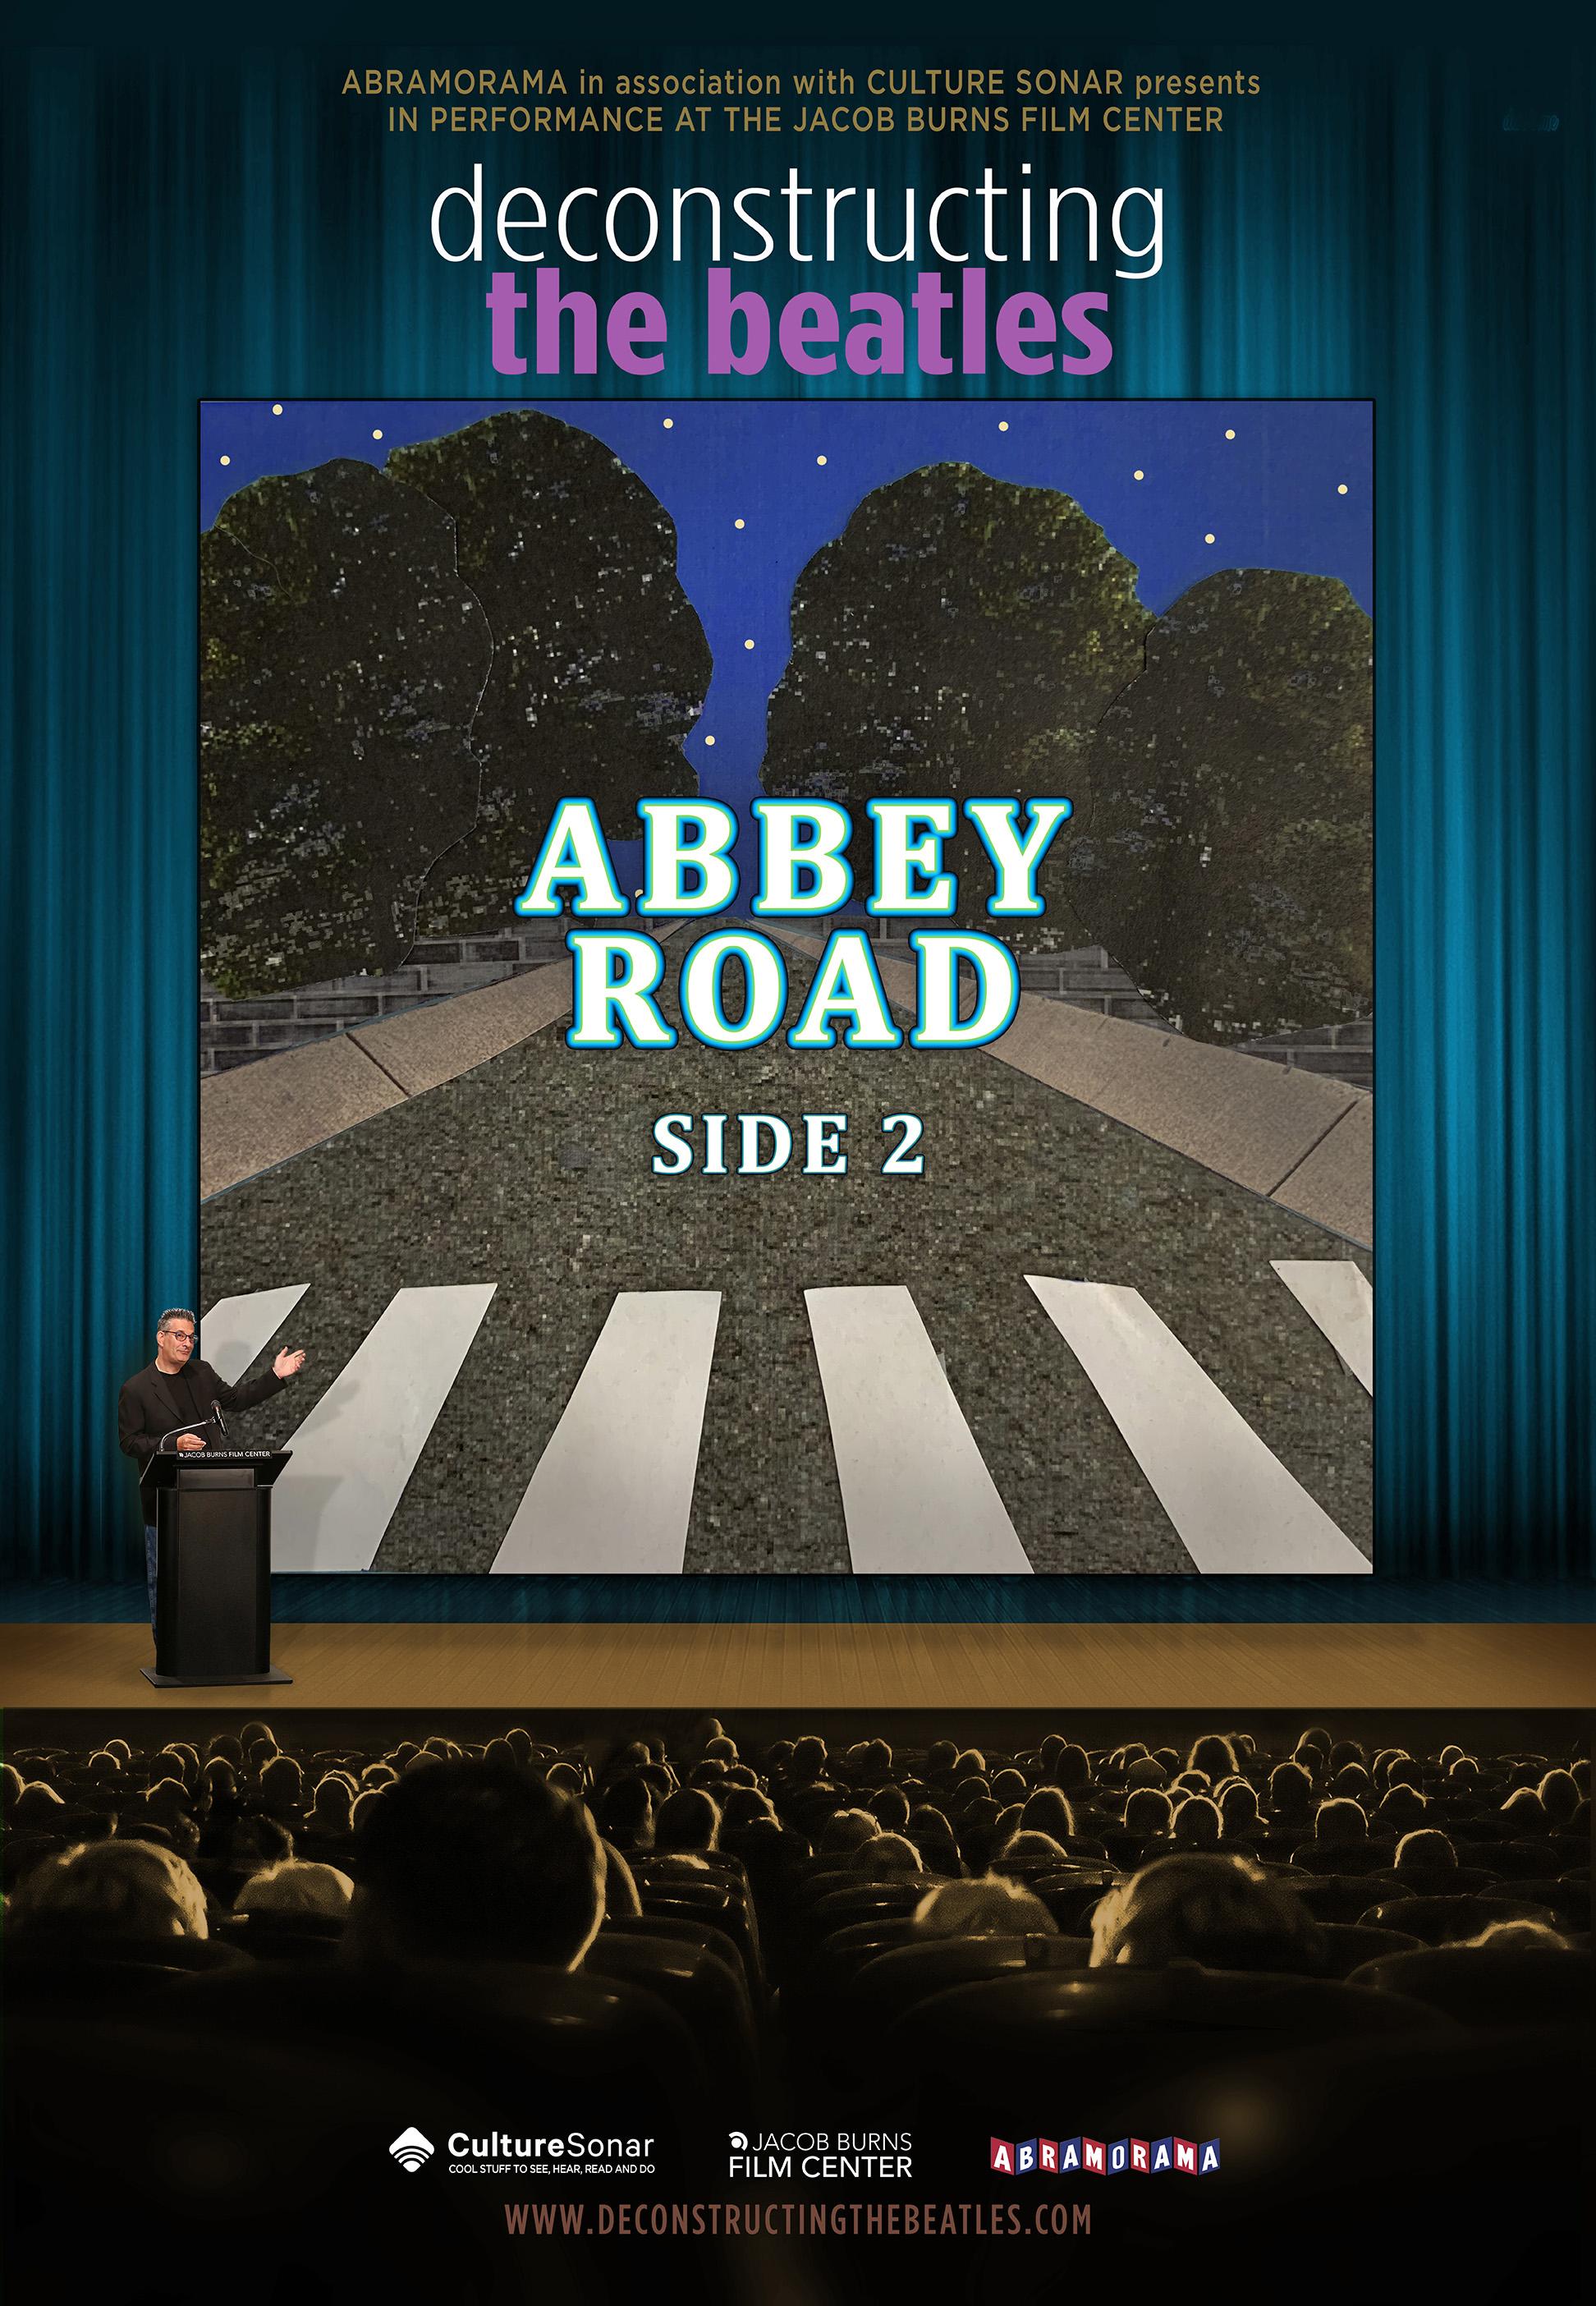 Abbey Road, Side 2  - Mon. 8/26 - Showtimes TBA